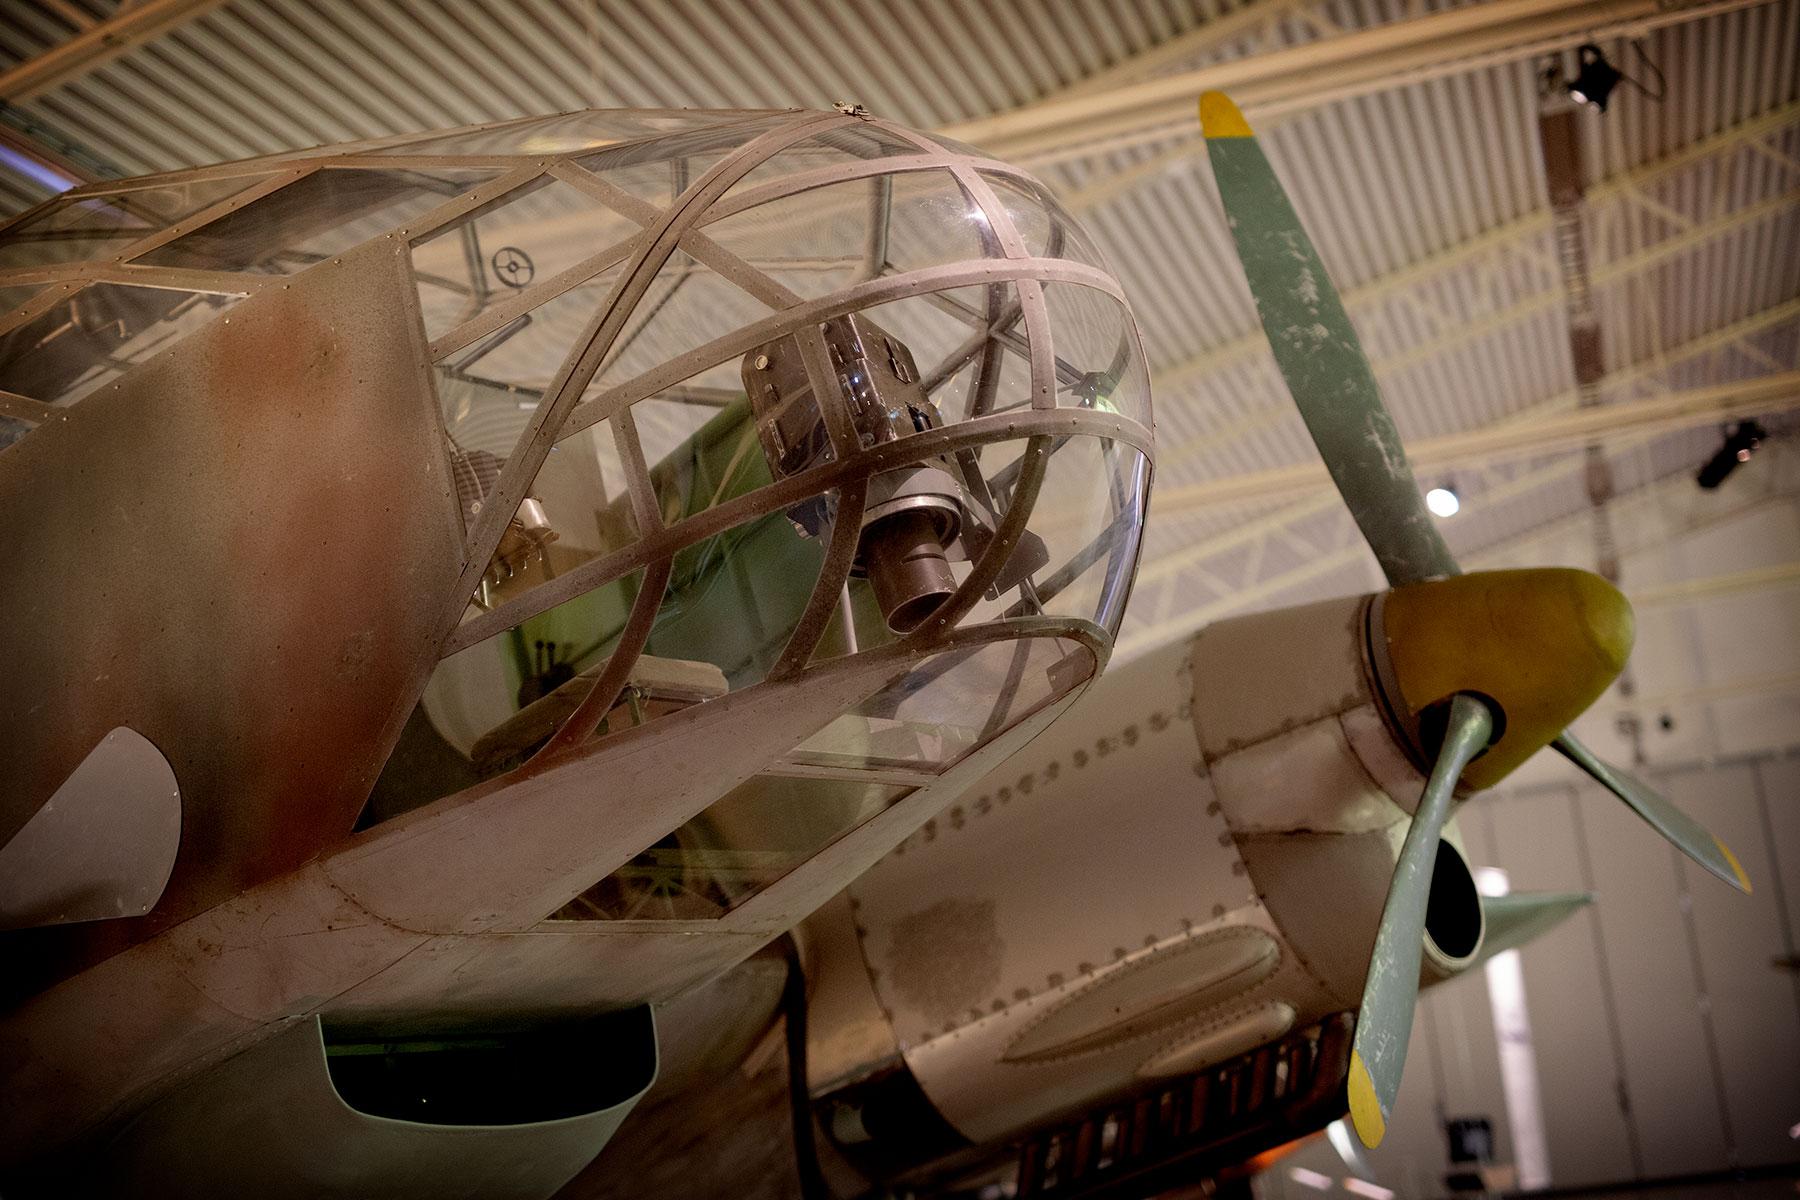 blogg-190215flygvapenmuseet10.jpg